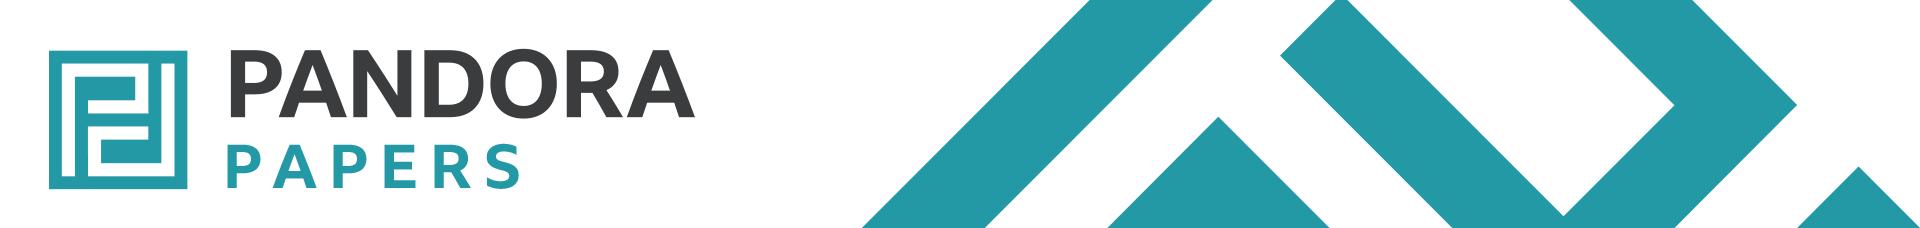 Banner de papeles de Pandora